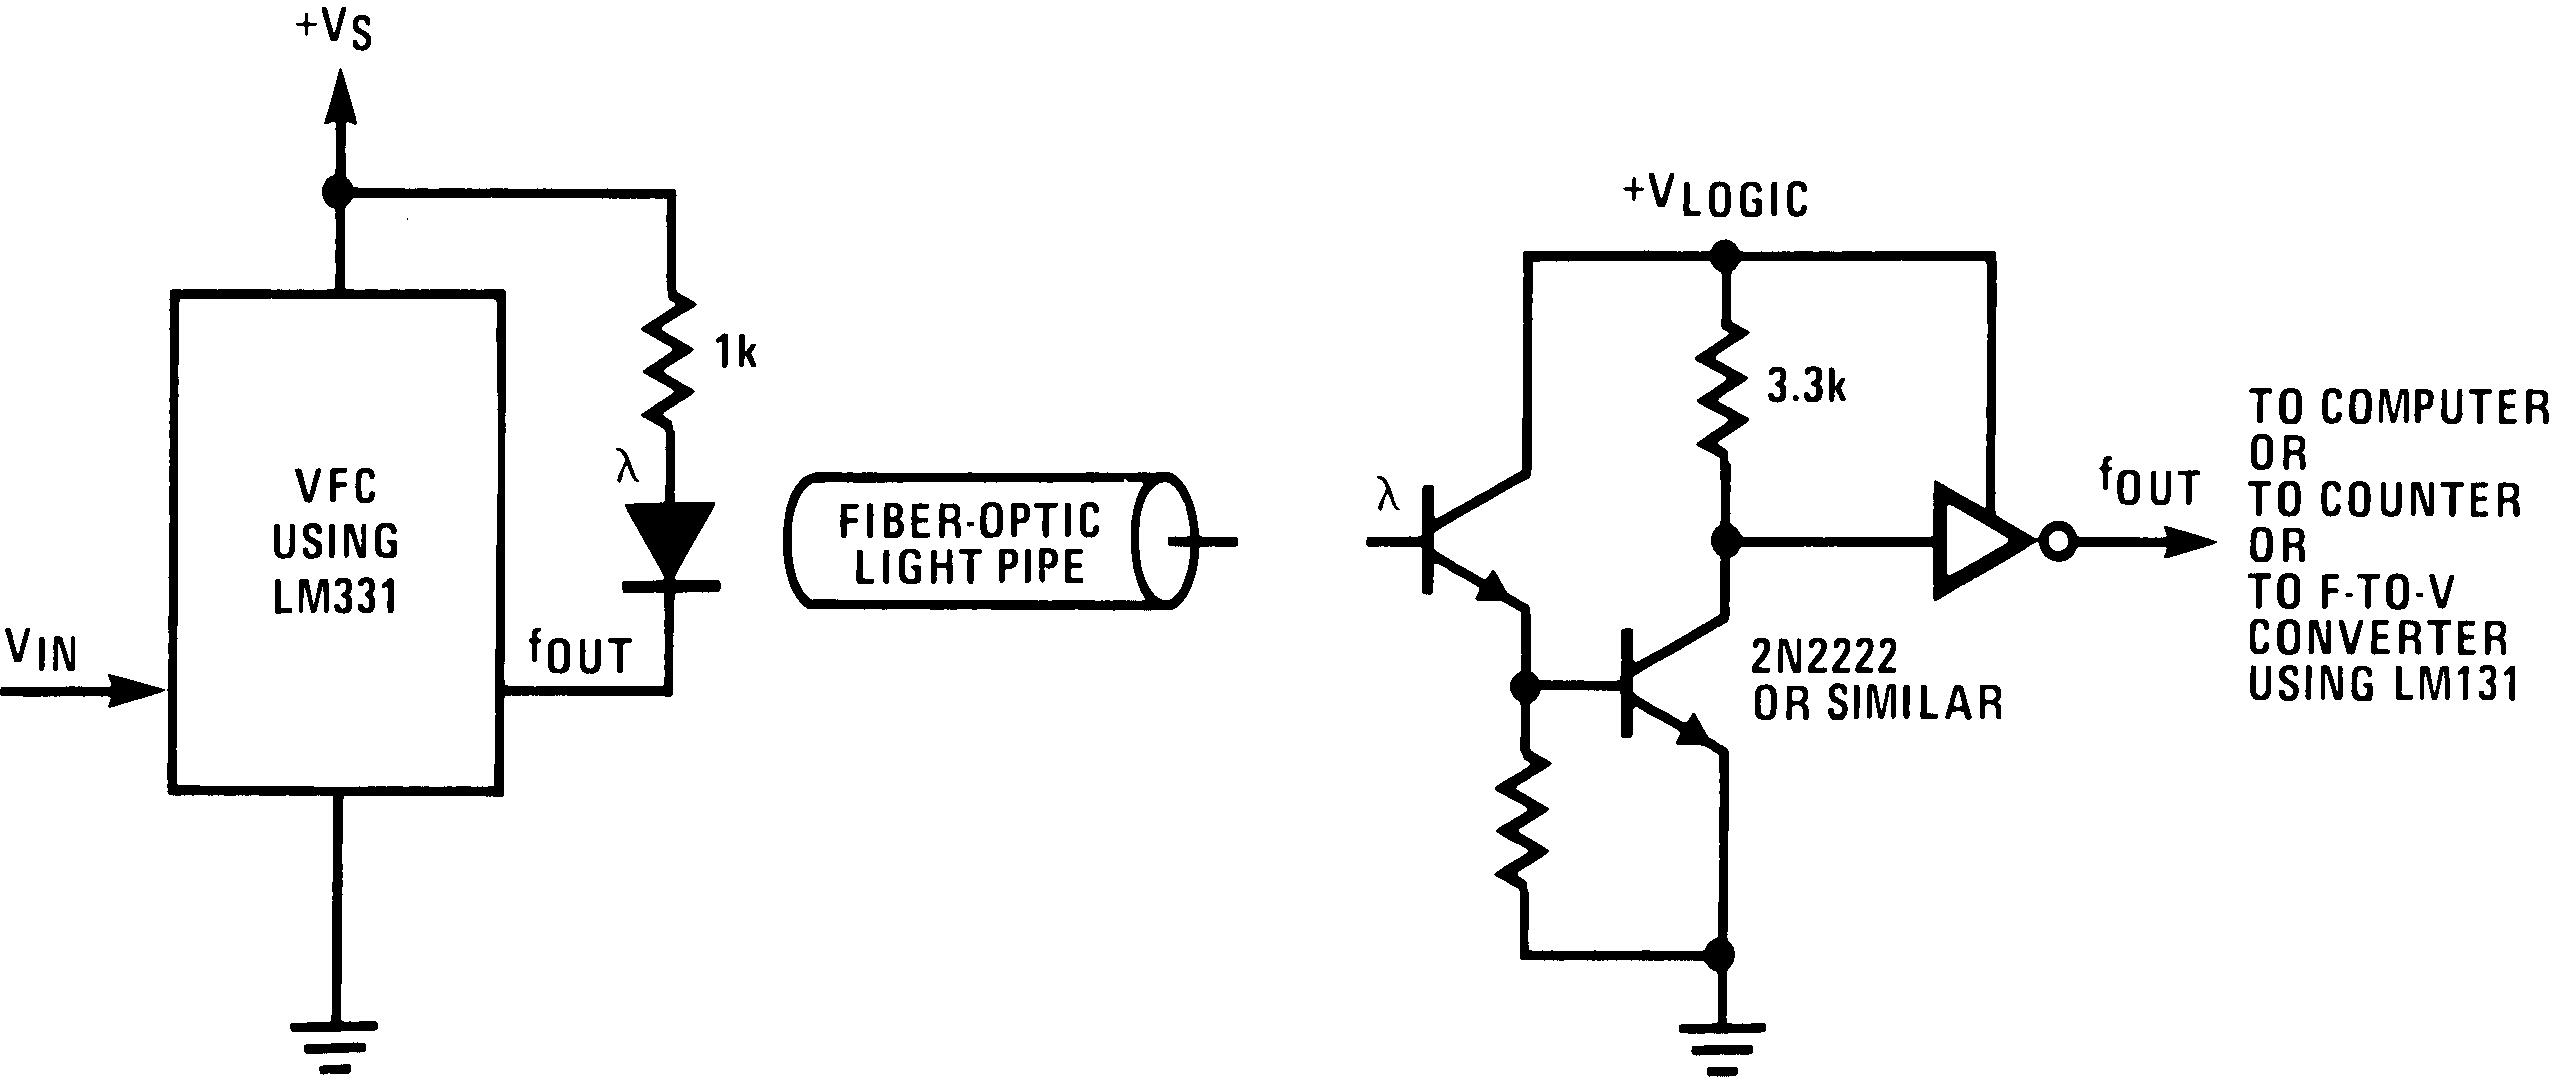 wrg 8096] f to v converter circuit diagram Converter Electronic Circuit Diagrams